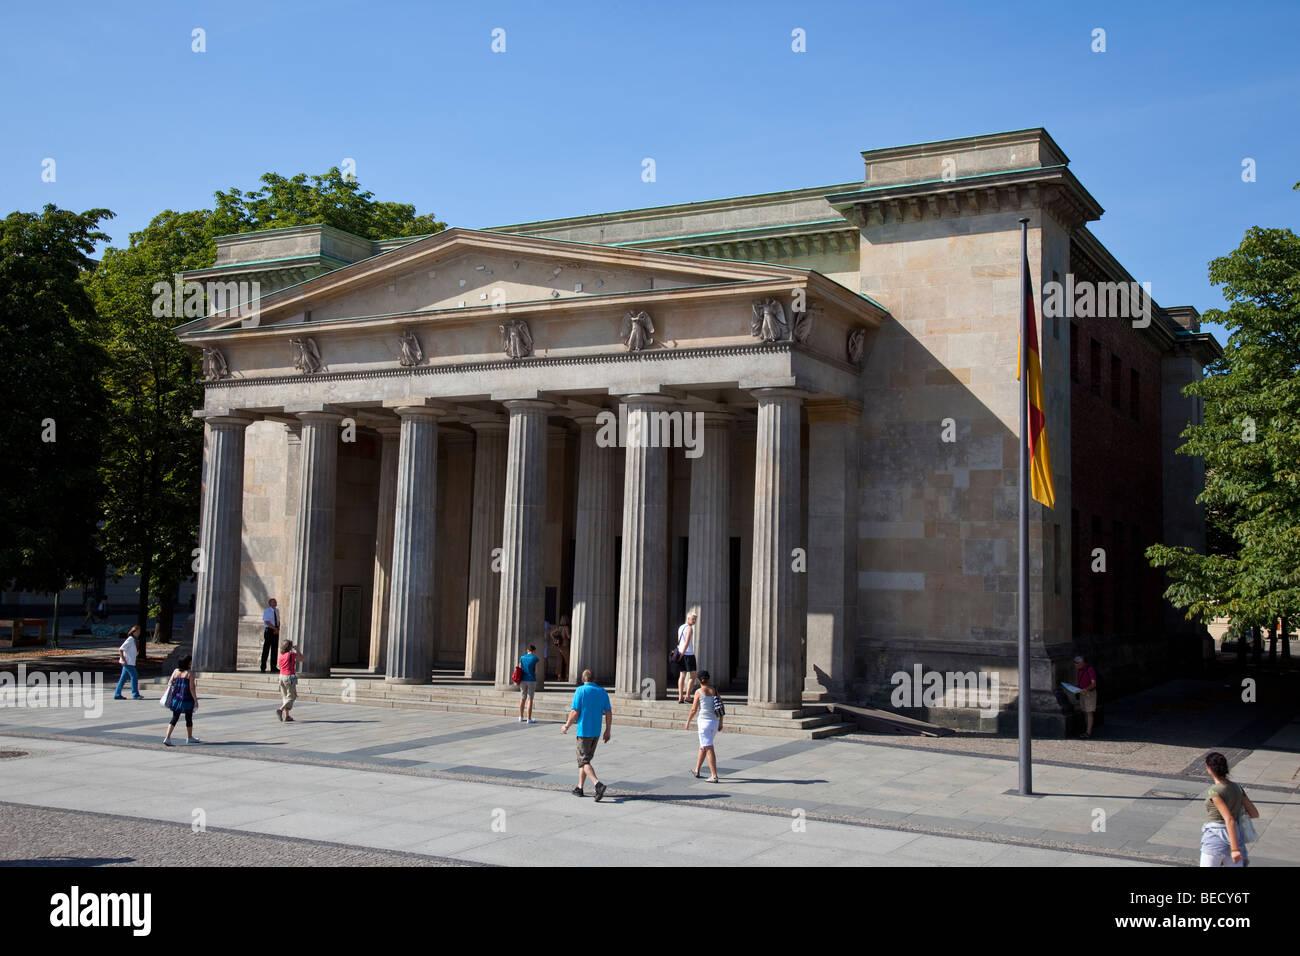 Berlin, Neue Wache, New Guard, Memorial for victims of war & tyranny on Unter den Linden - Stock Image